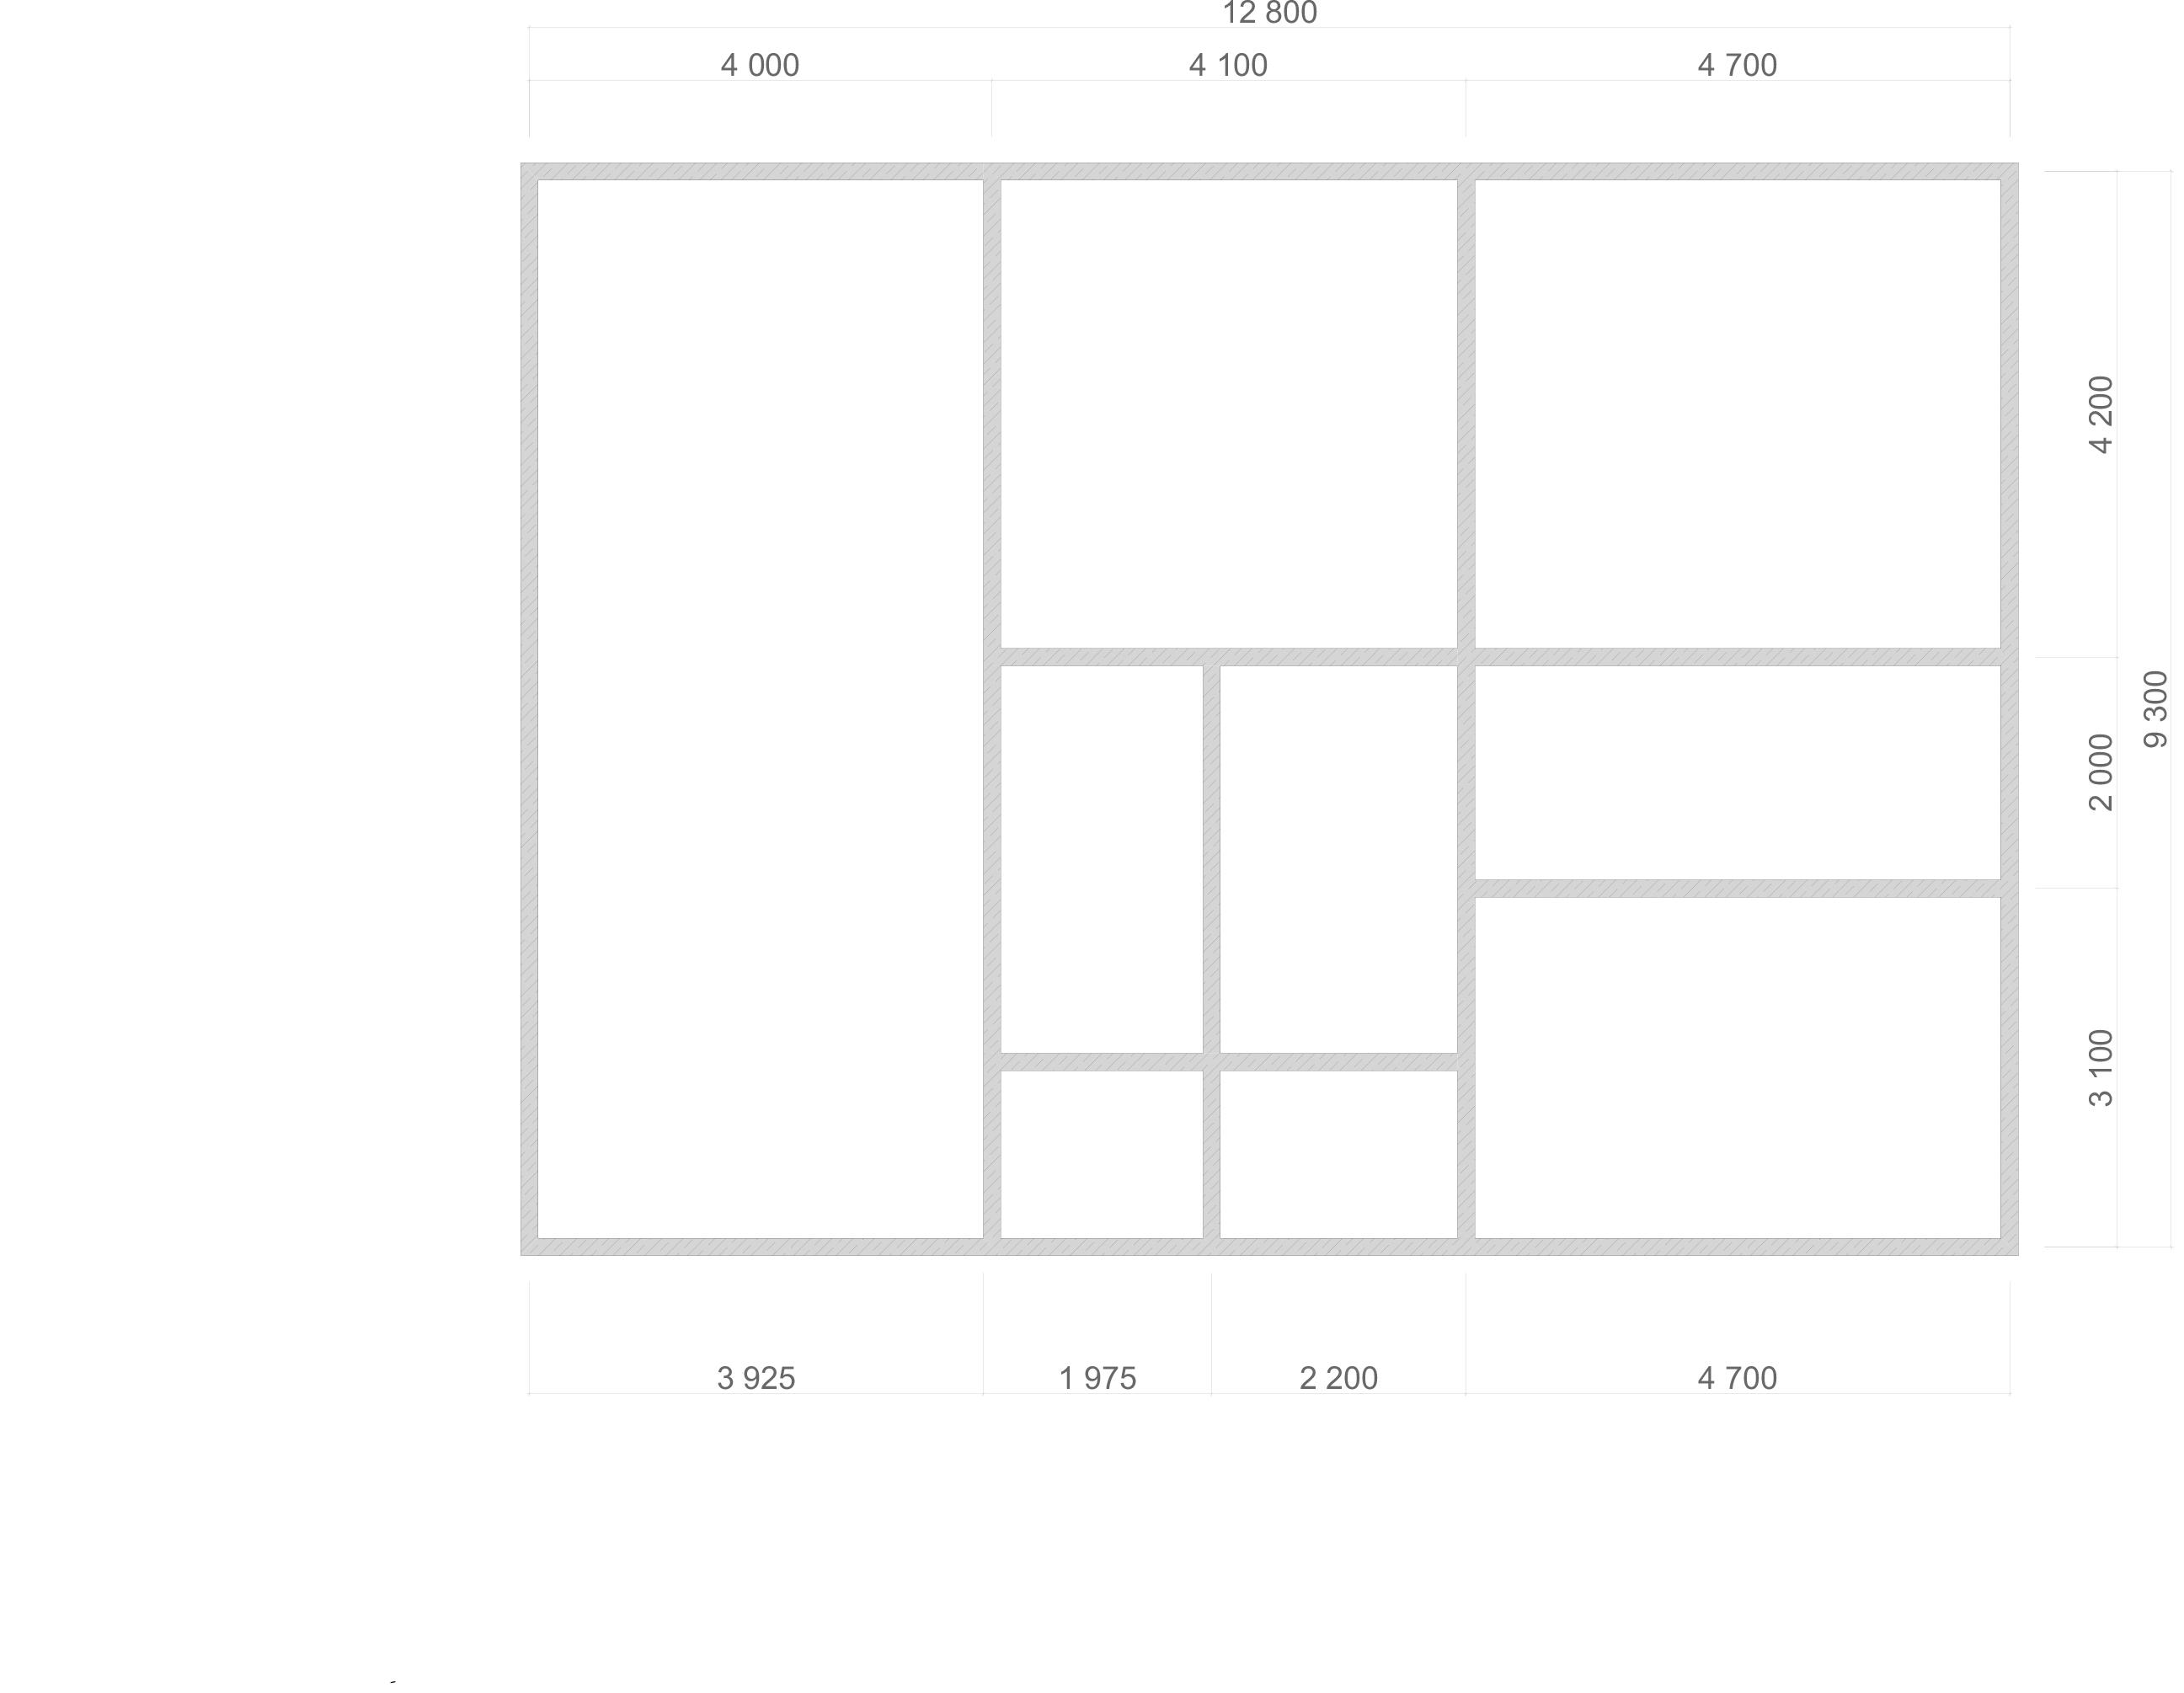 Проект дома из бруса 9,3х12,8 1,5 этажа с гаражом. План фундамента.